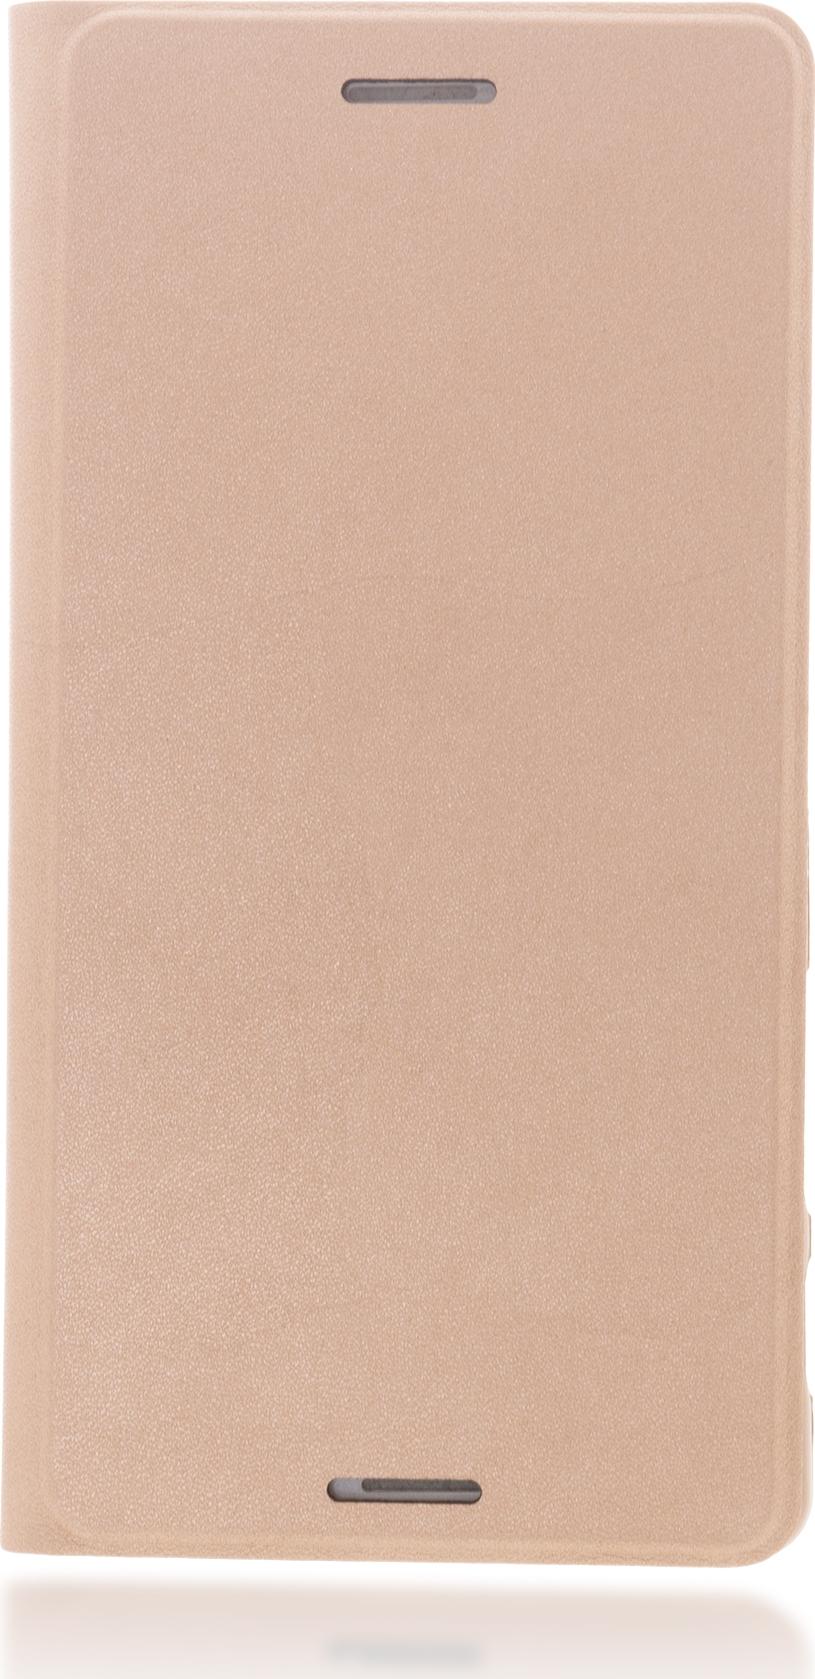 Чехол Brosco Book для Sony Xperia X Perfomance, розовый цена и фото